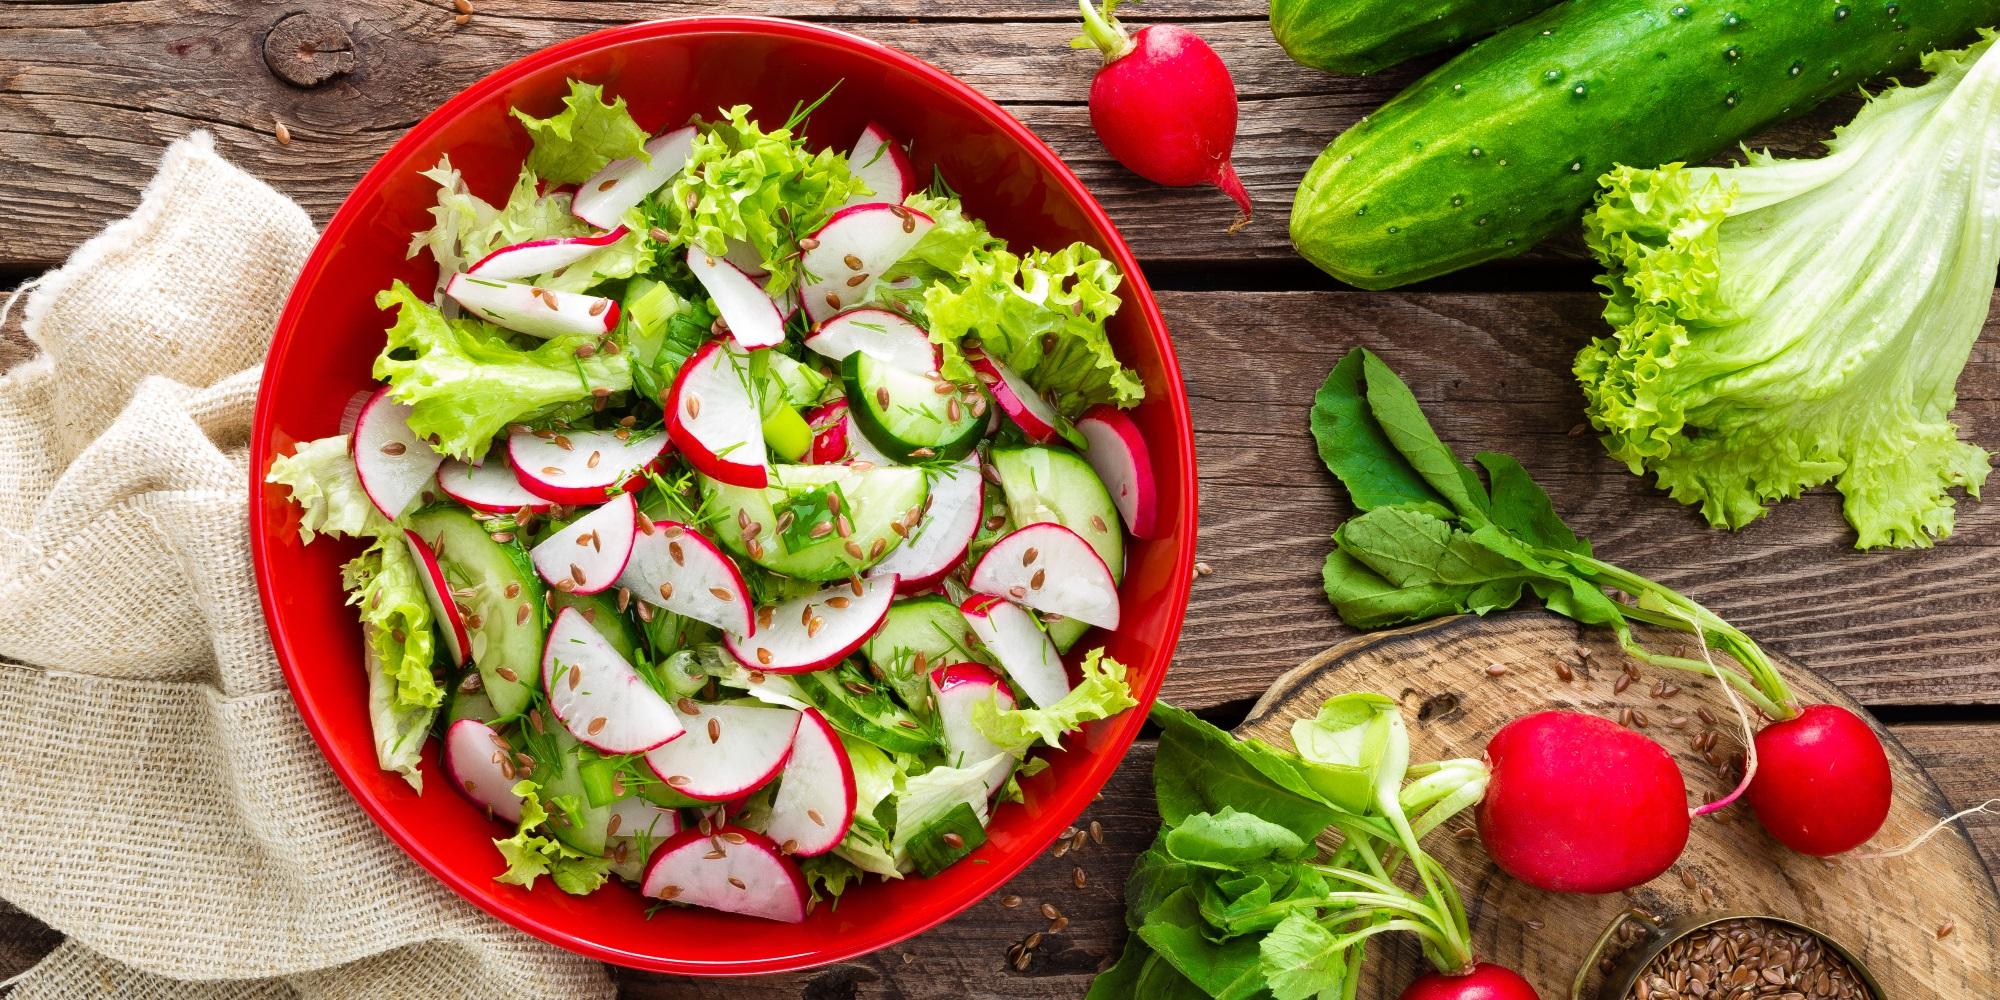 Green salad, radishes and cucumbers